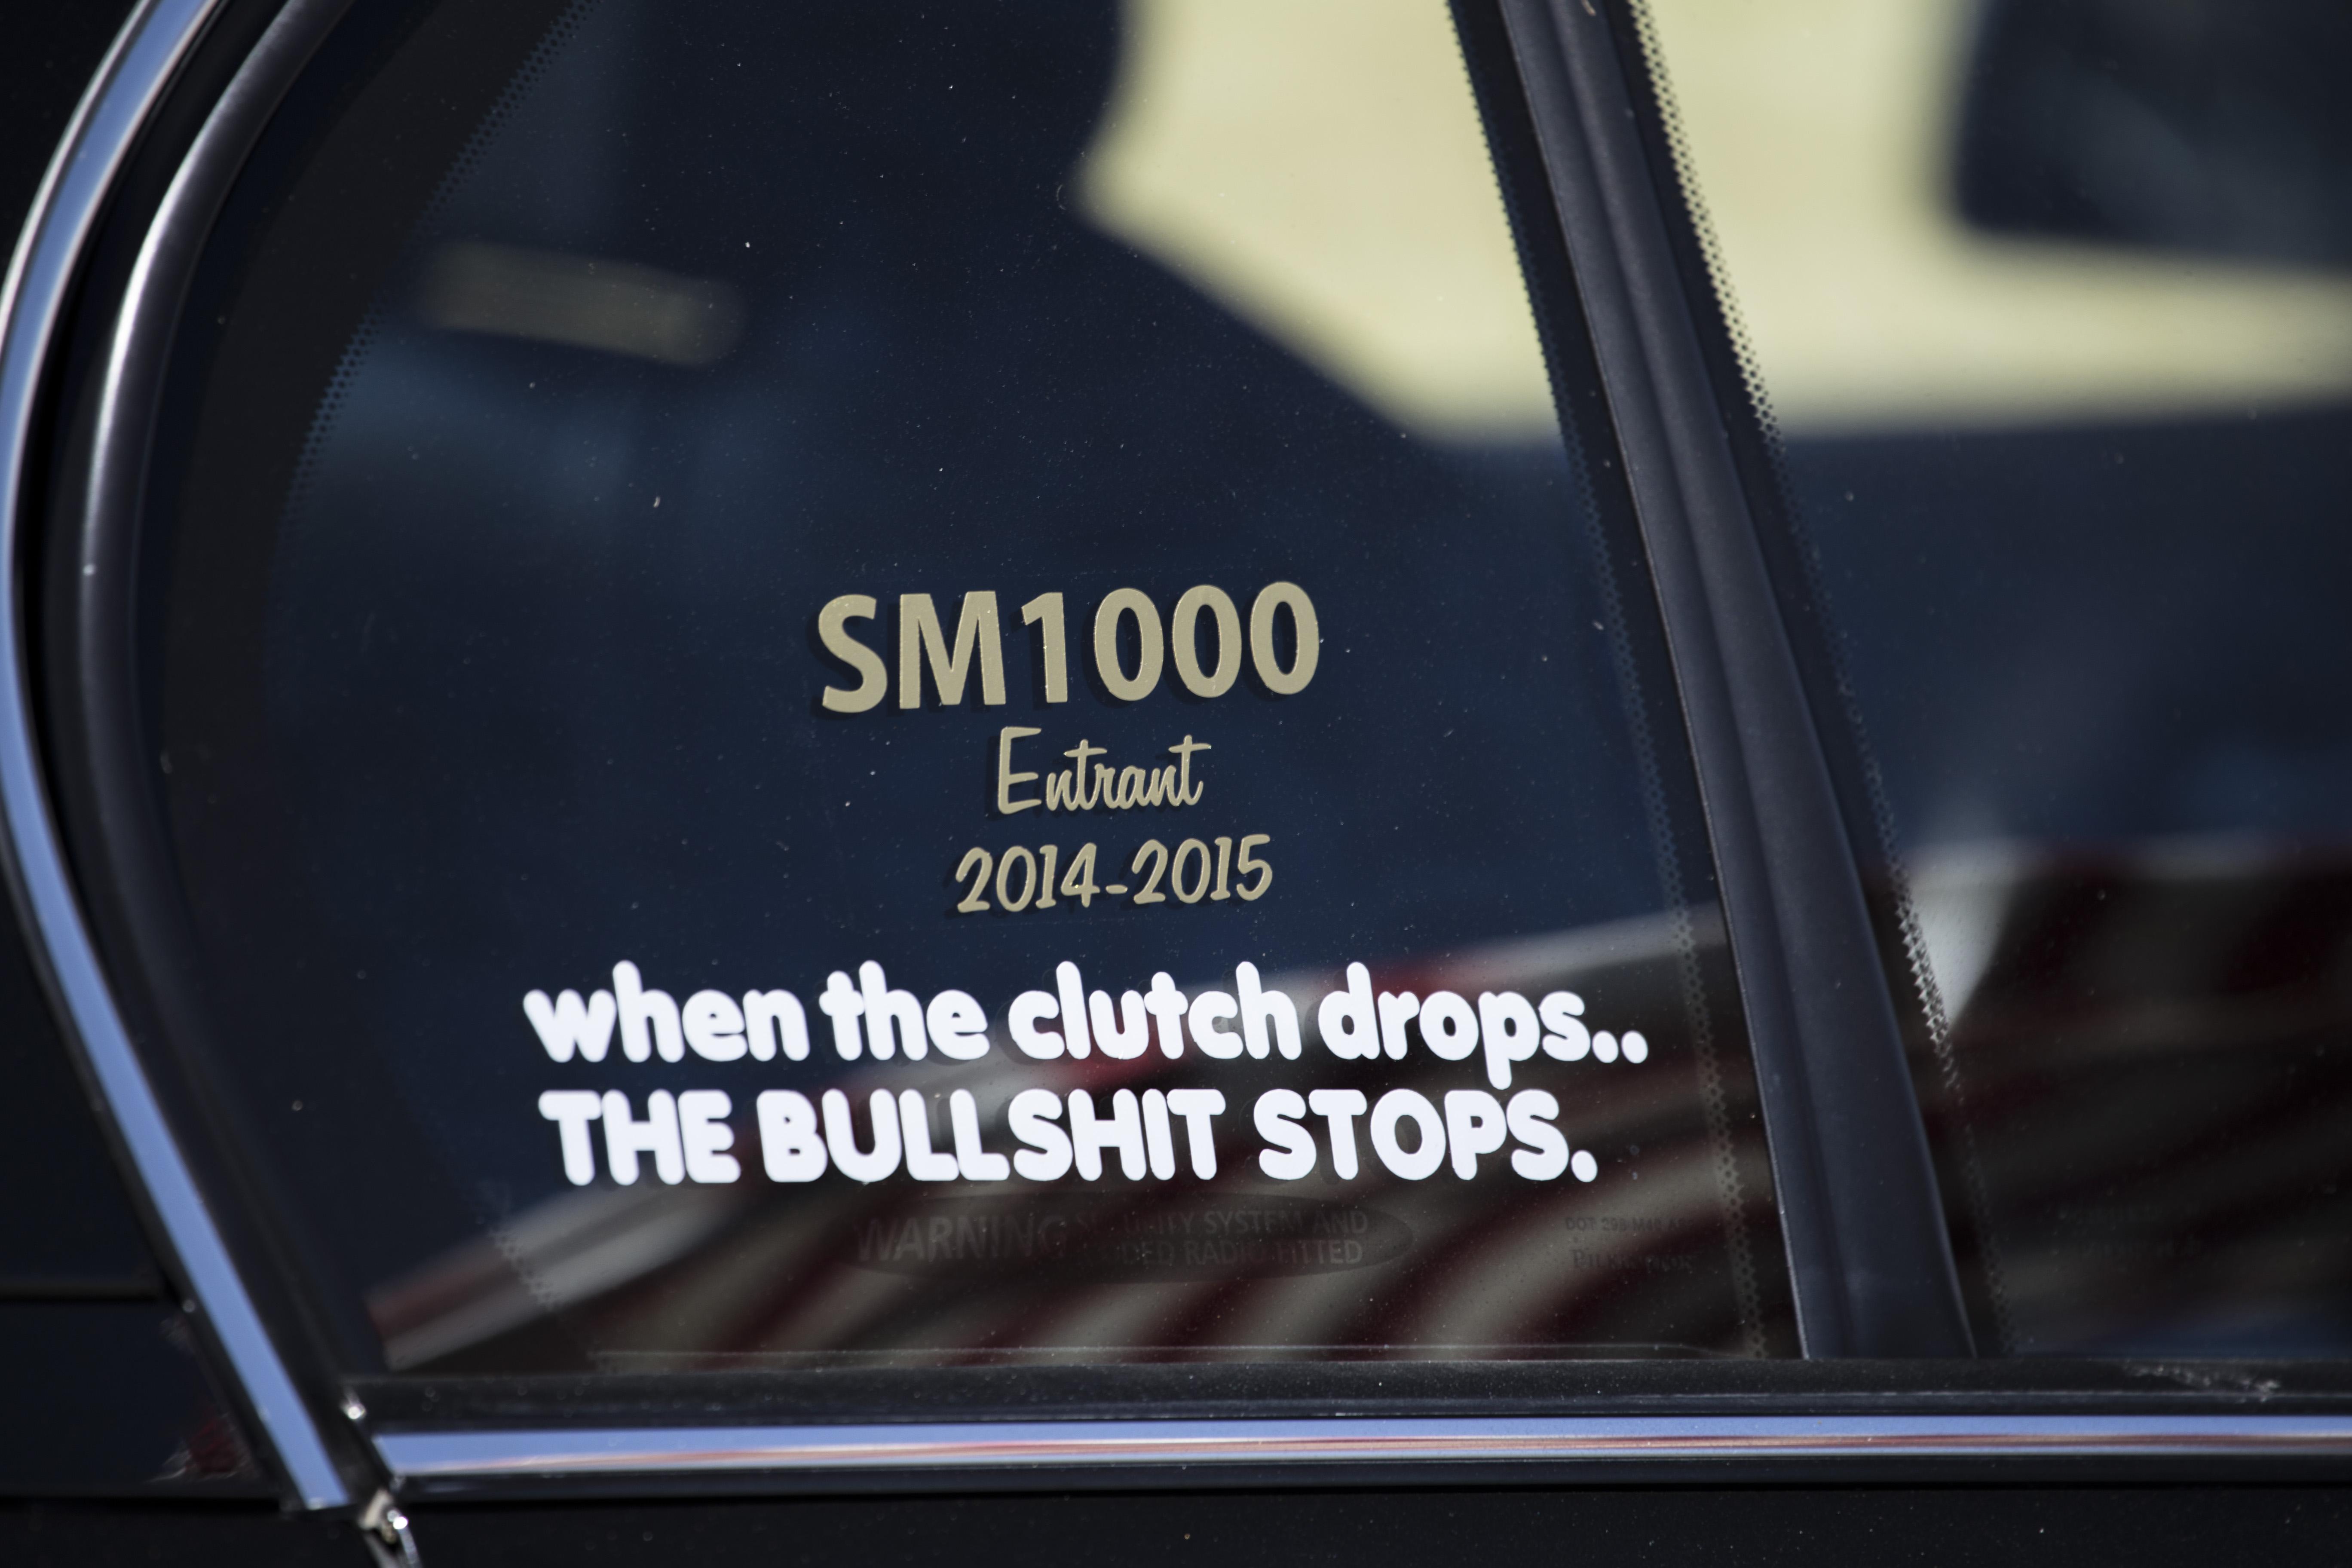 clutchdropbsstop